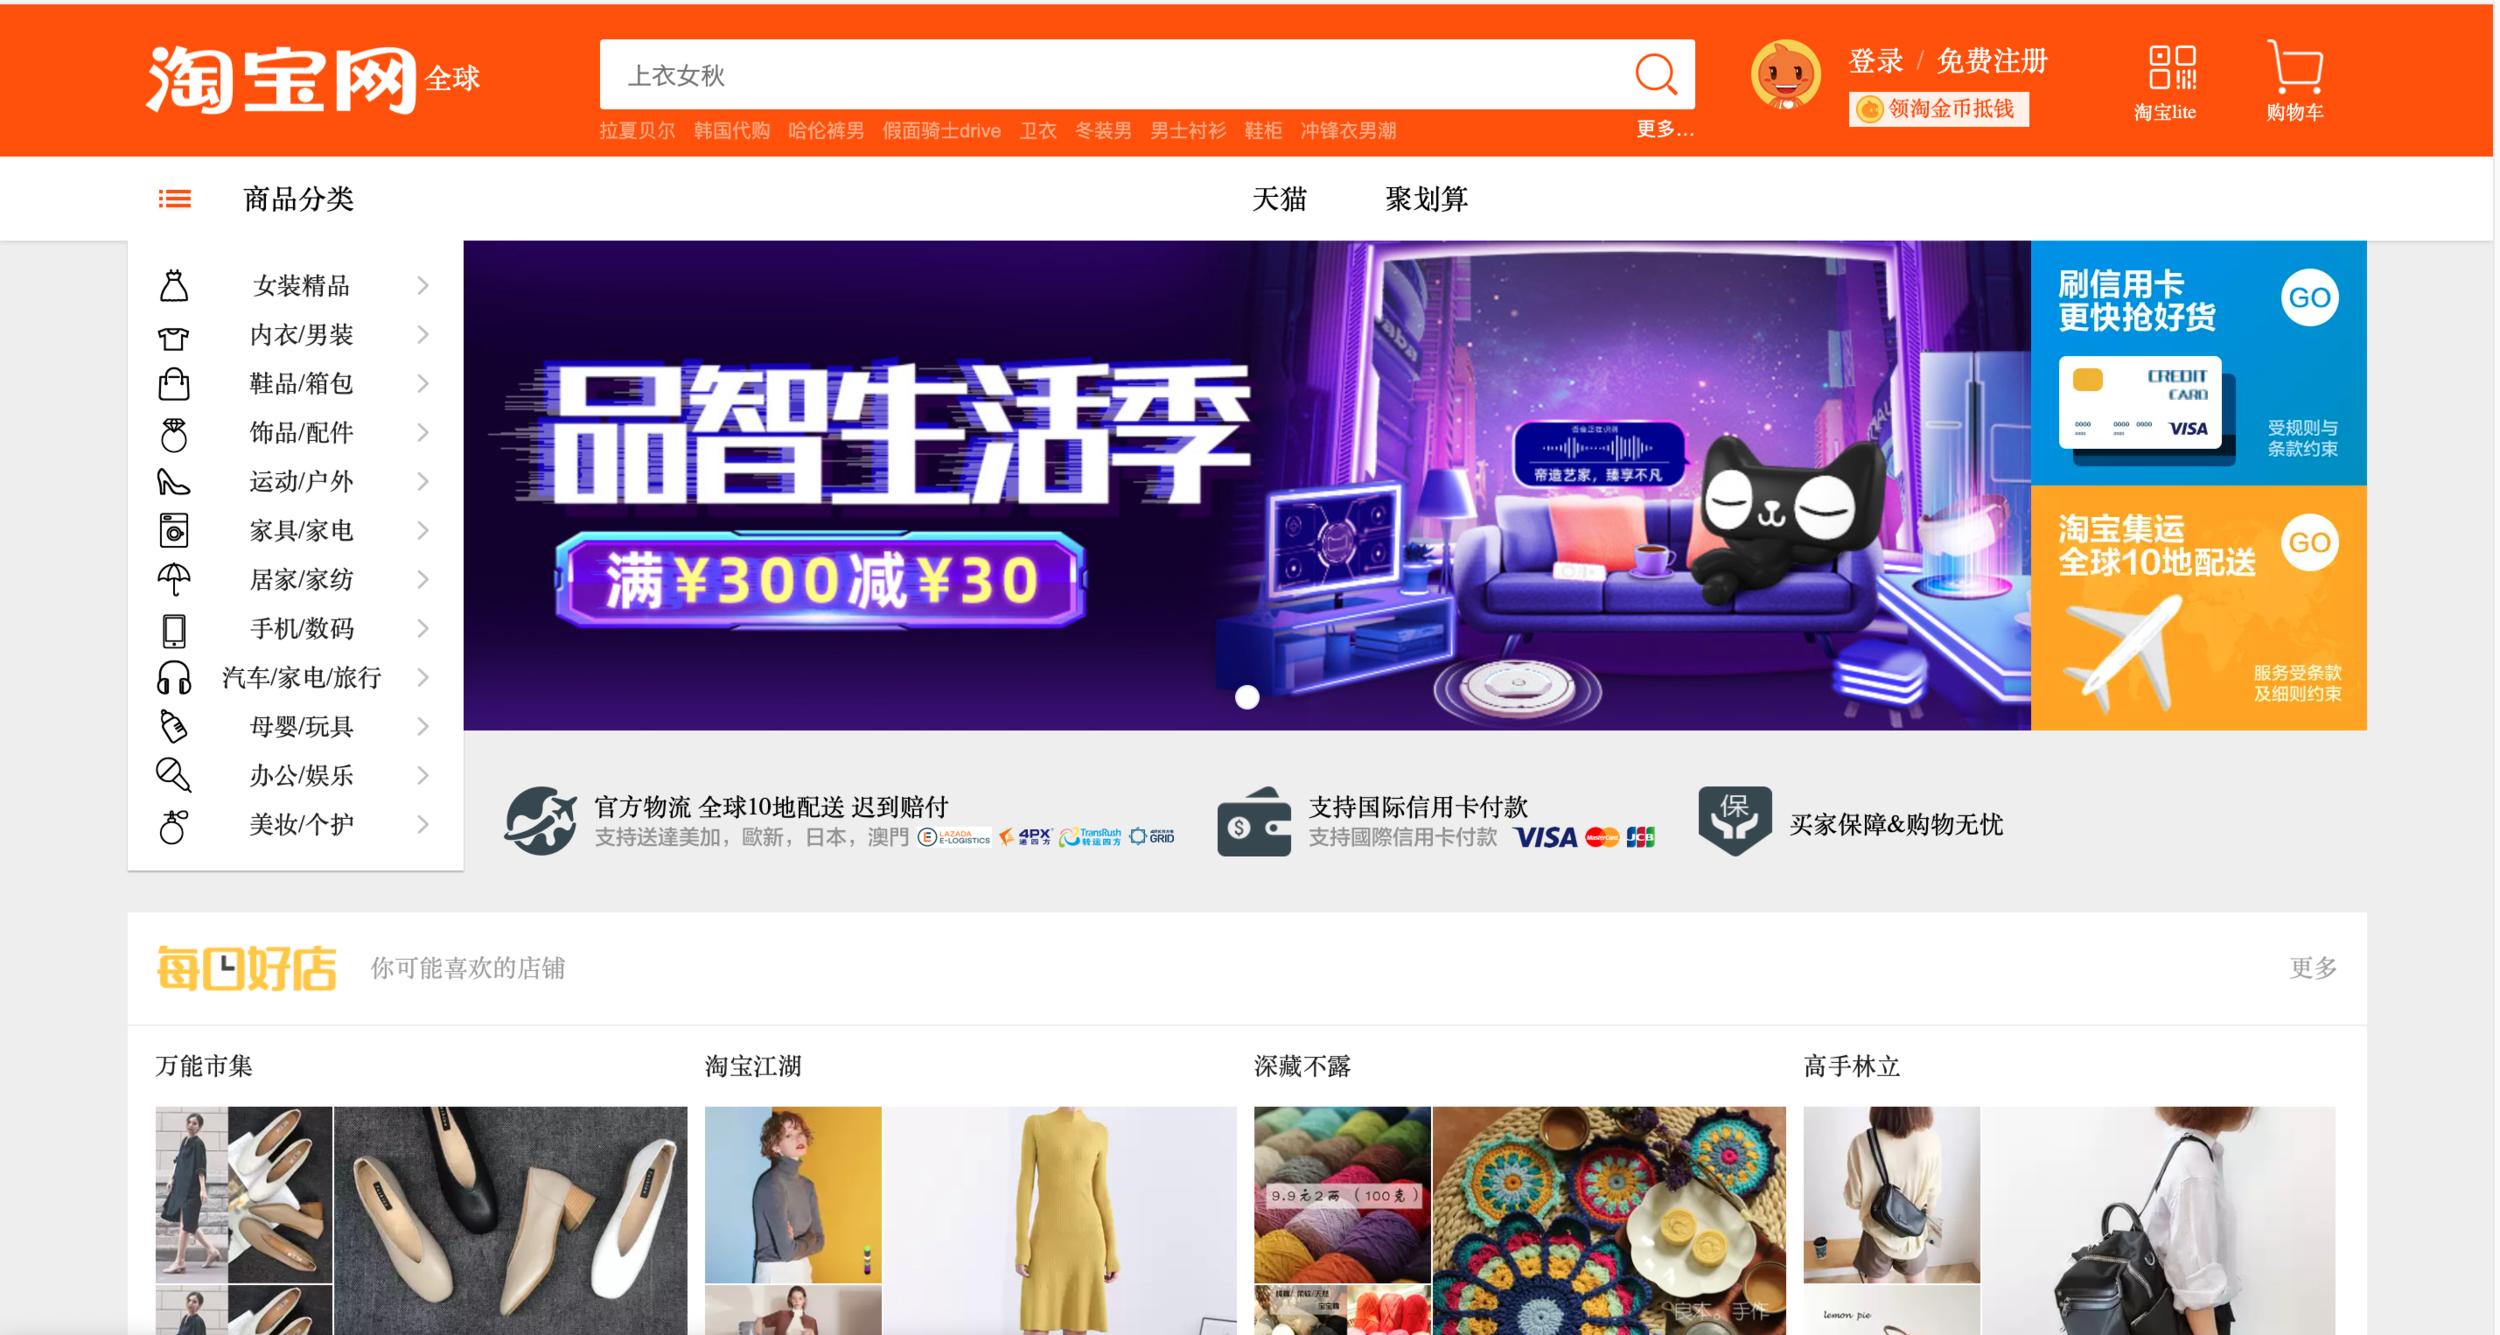 Page365-เว็บสั่งของจากจีน-Taobao.png